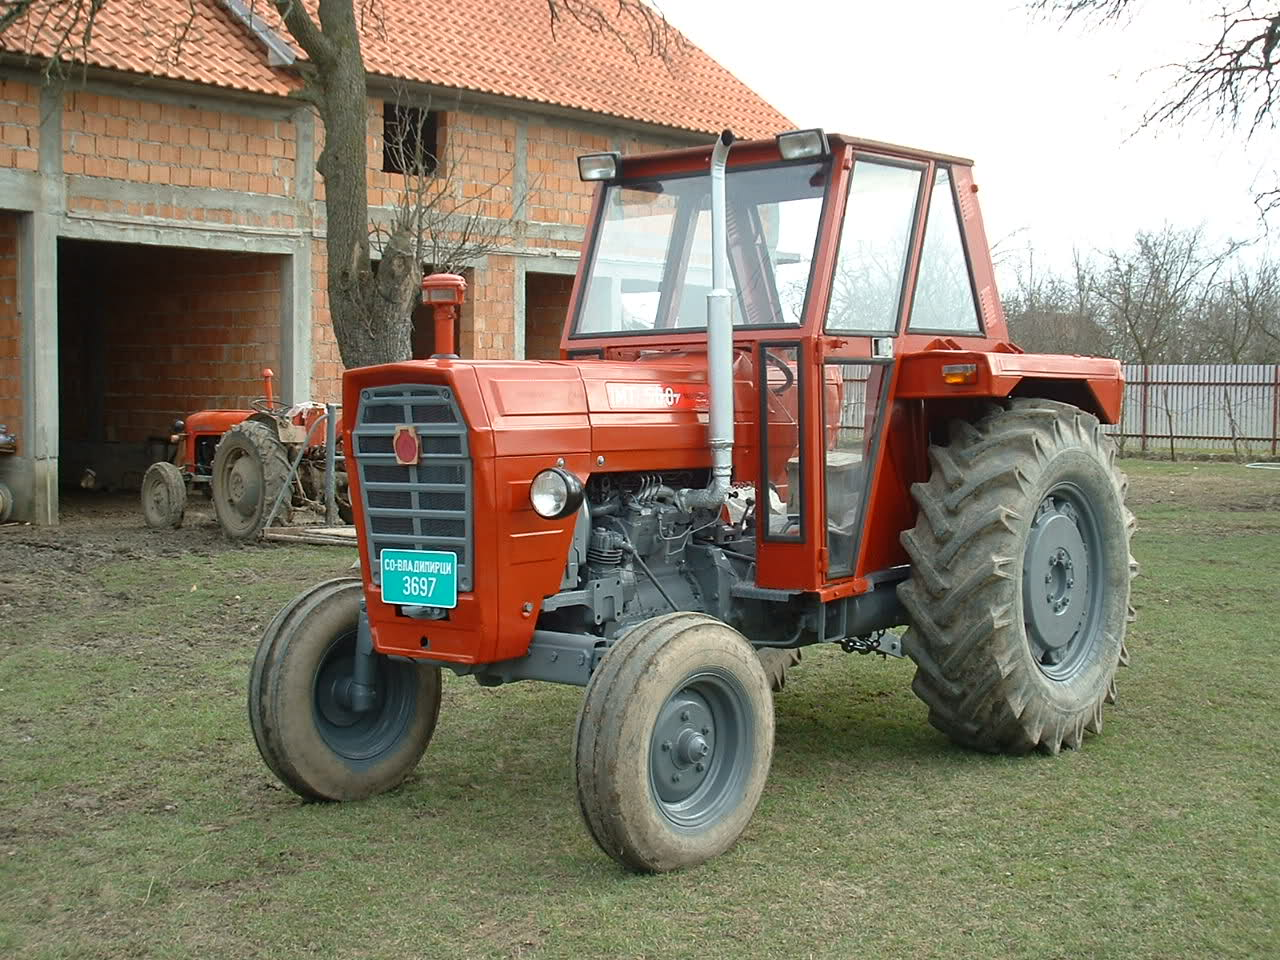 Imt 560 Farm Tractor | Imt Farm Tractors: Imt Farm Tractors